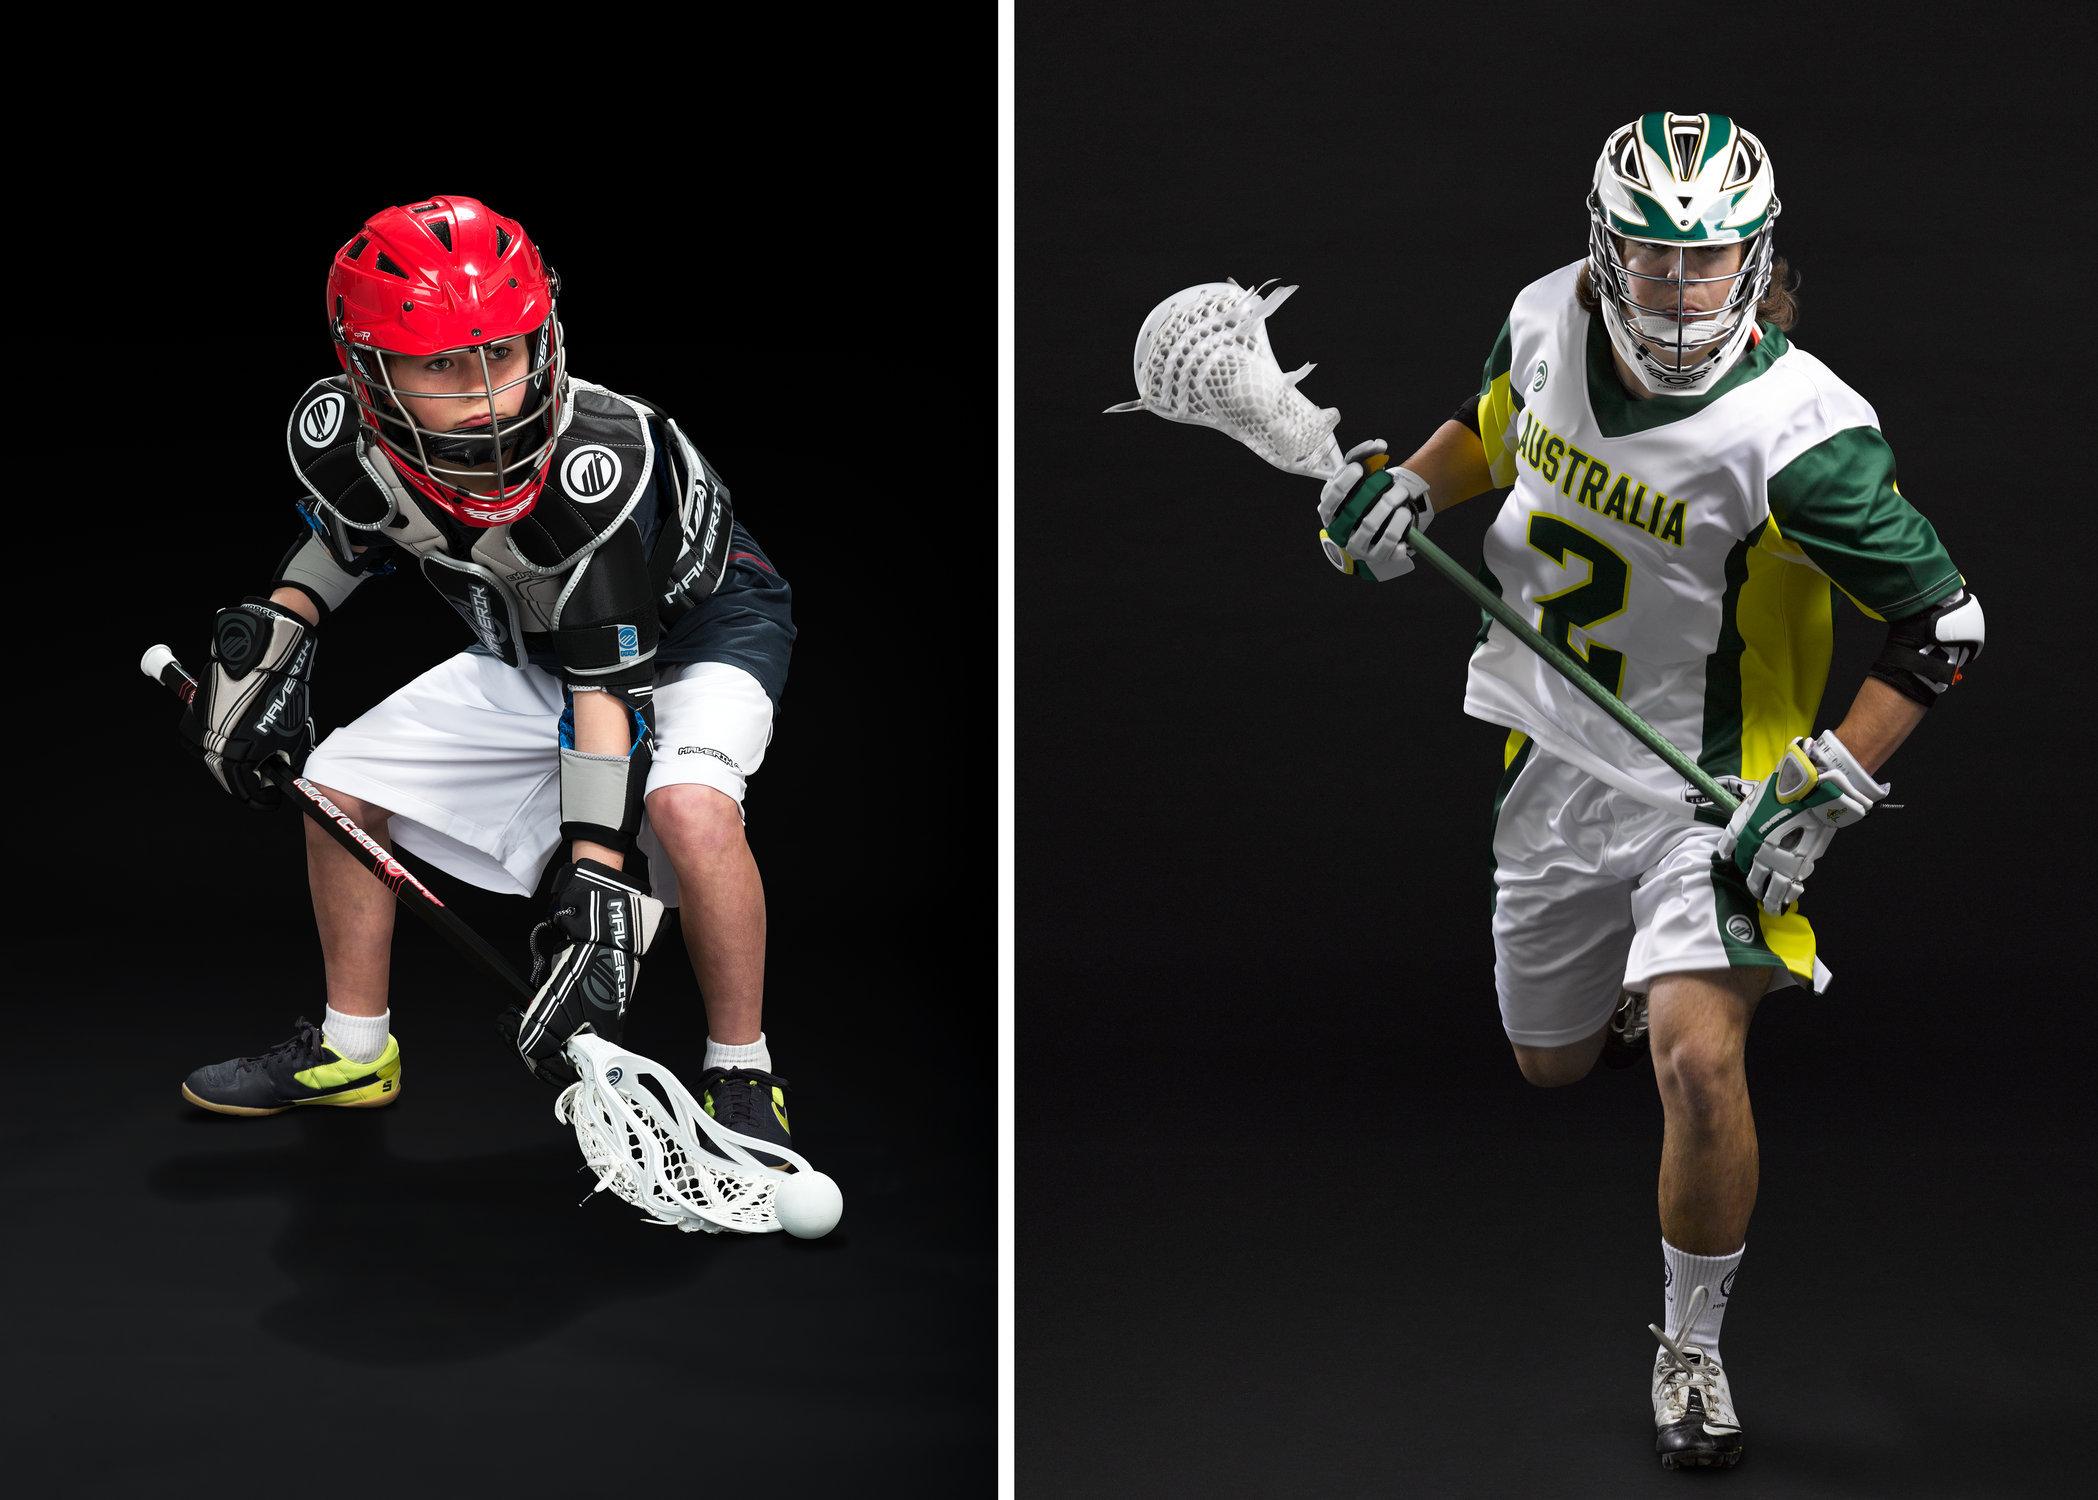 Maverik Lacrosse players for advertising needs